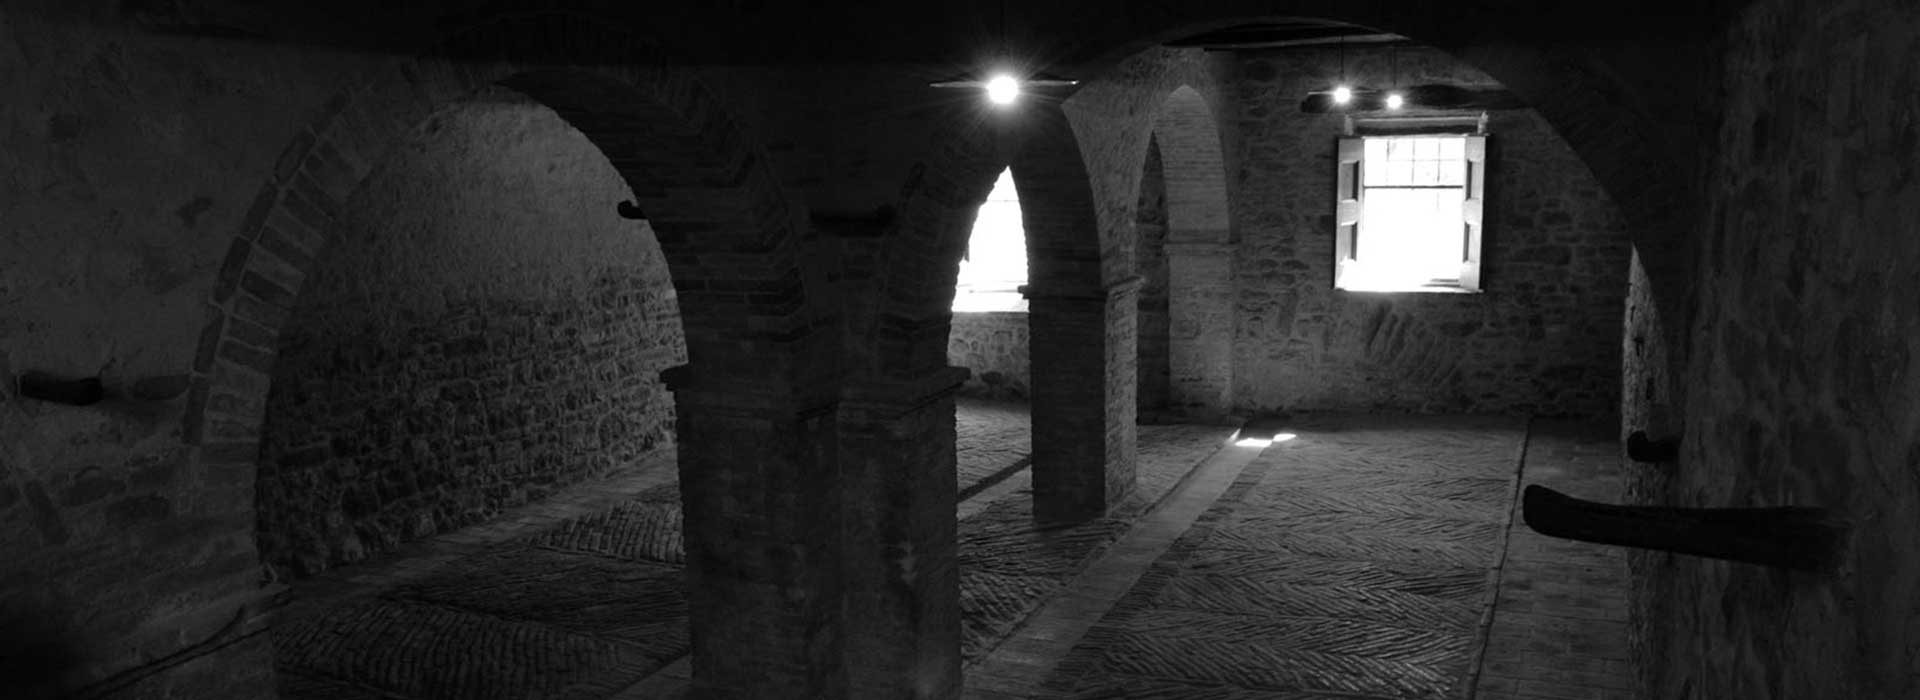 cantina-antica-palazzo-valturio-sotterranei